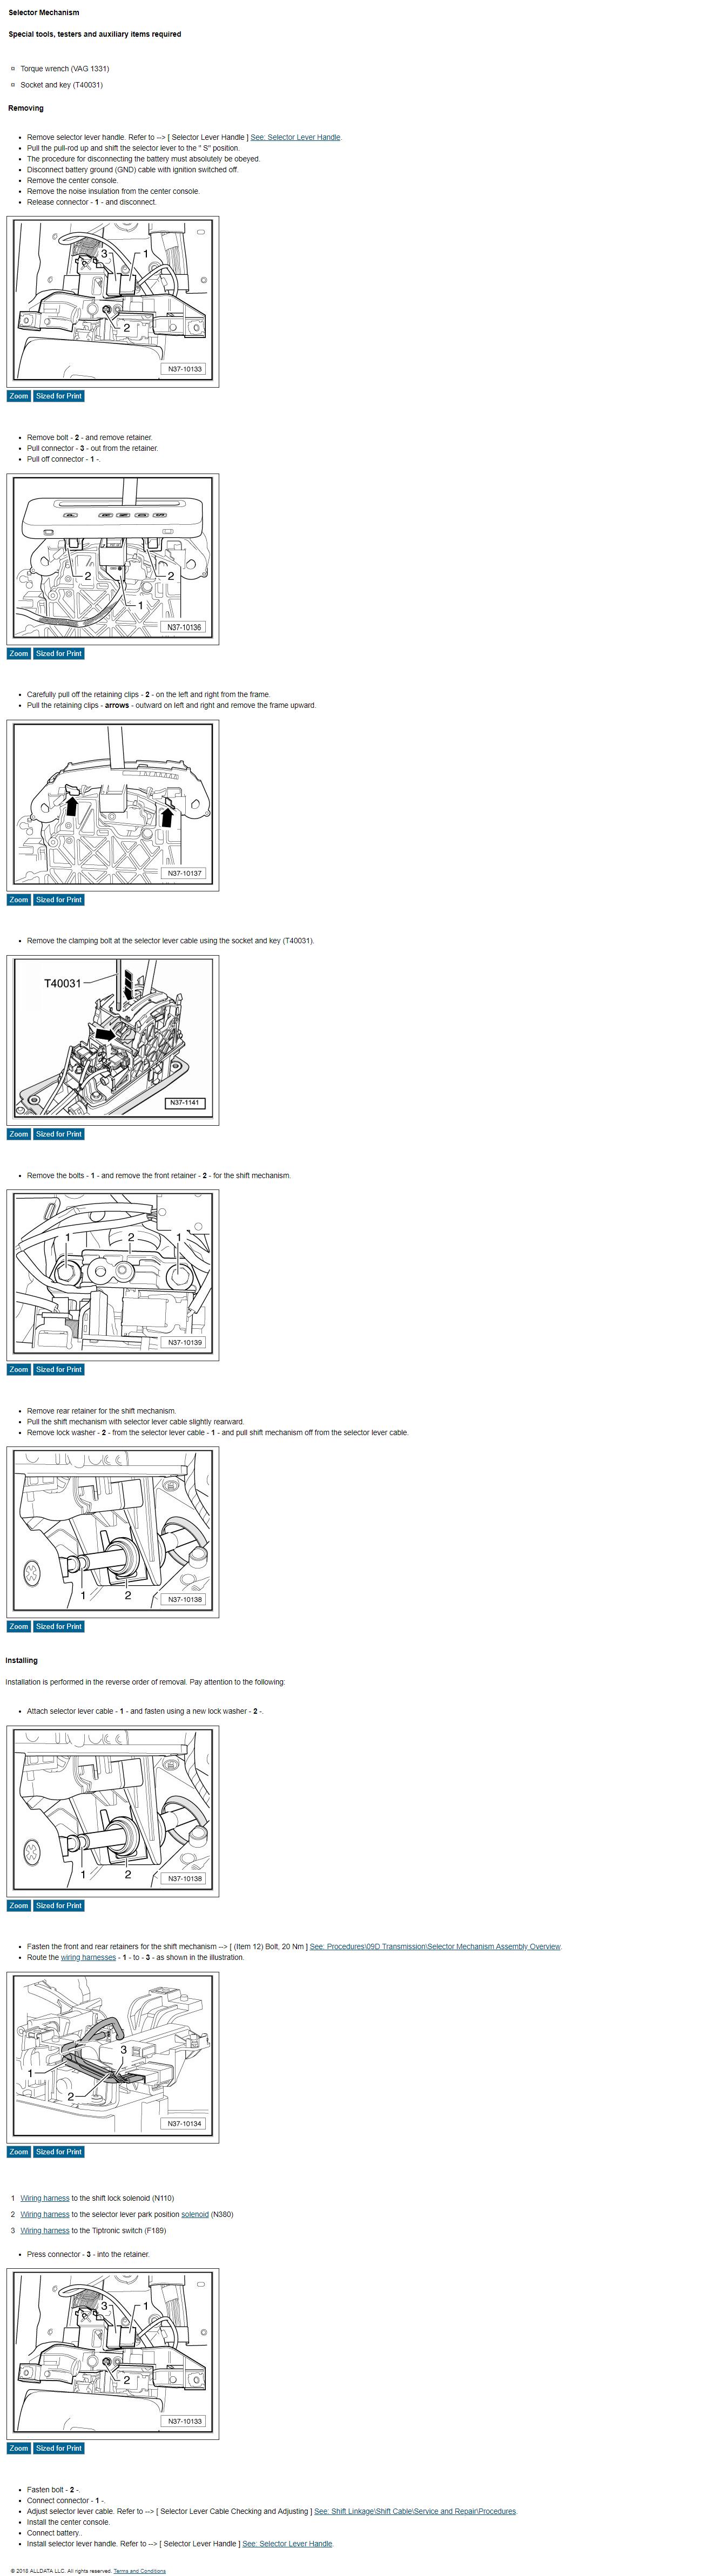 Transmission Shifter Linkage Diagram On Vw Beetle Gear Shift Diagram